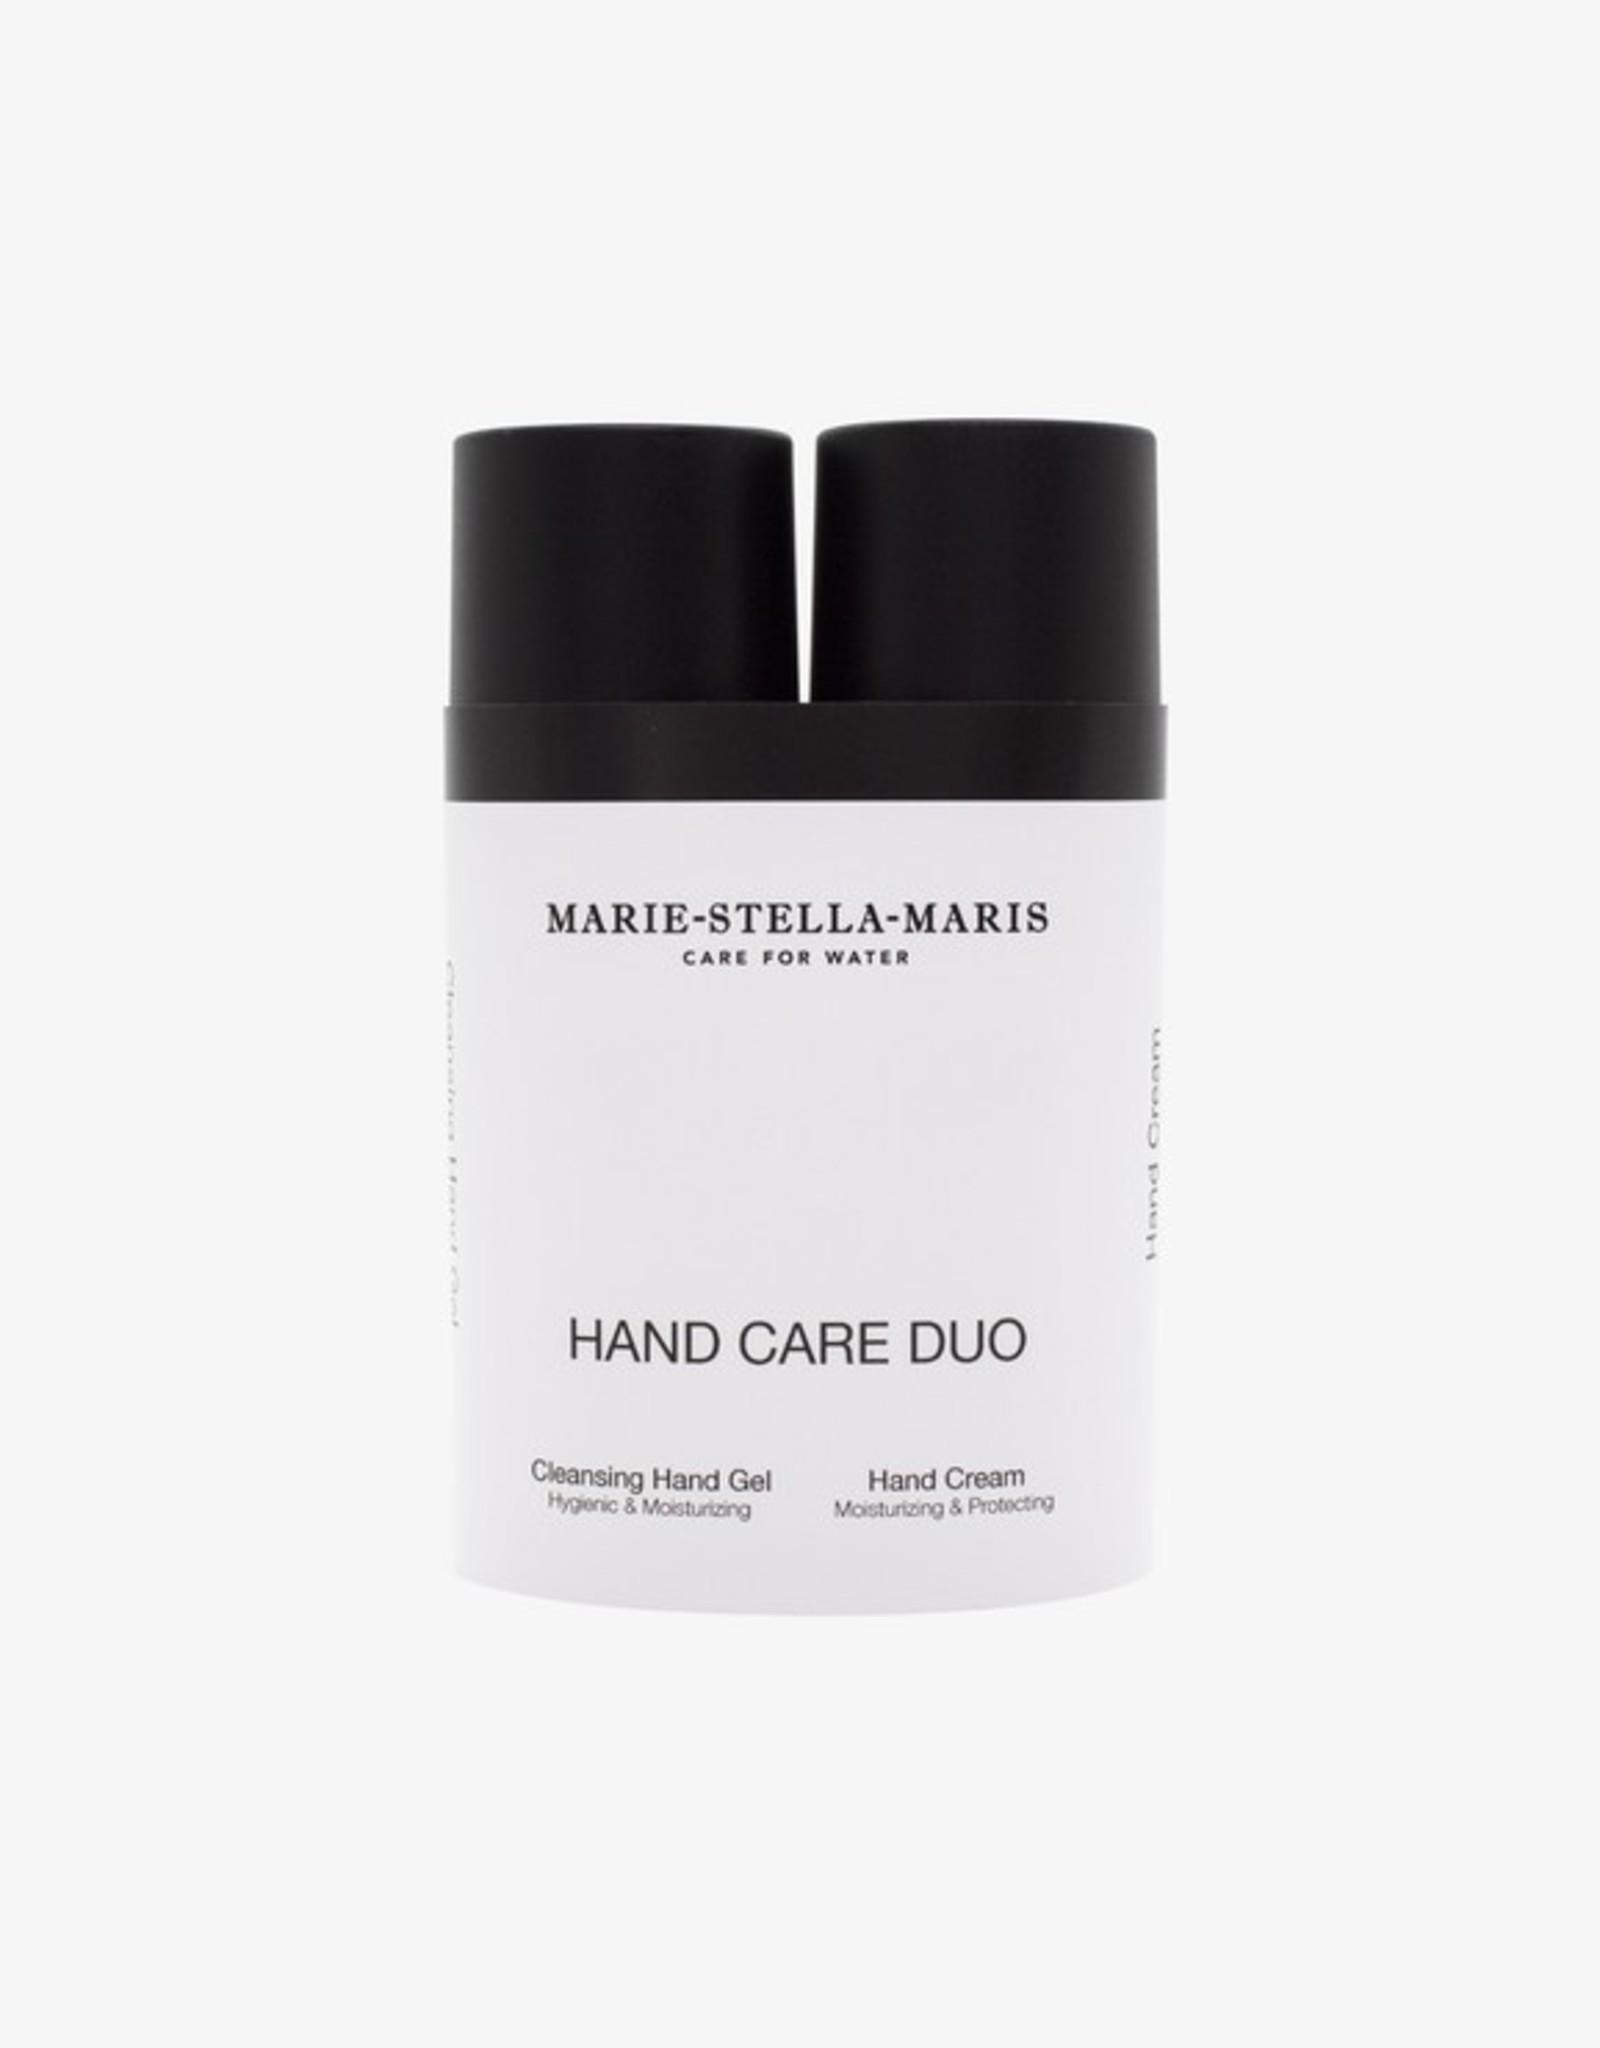 Marie-Stella-Maris Hand Care Duo